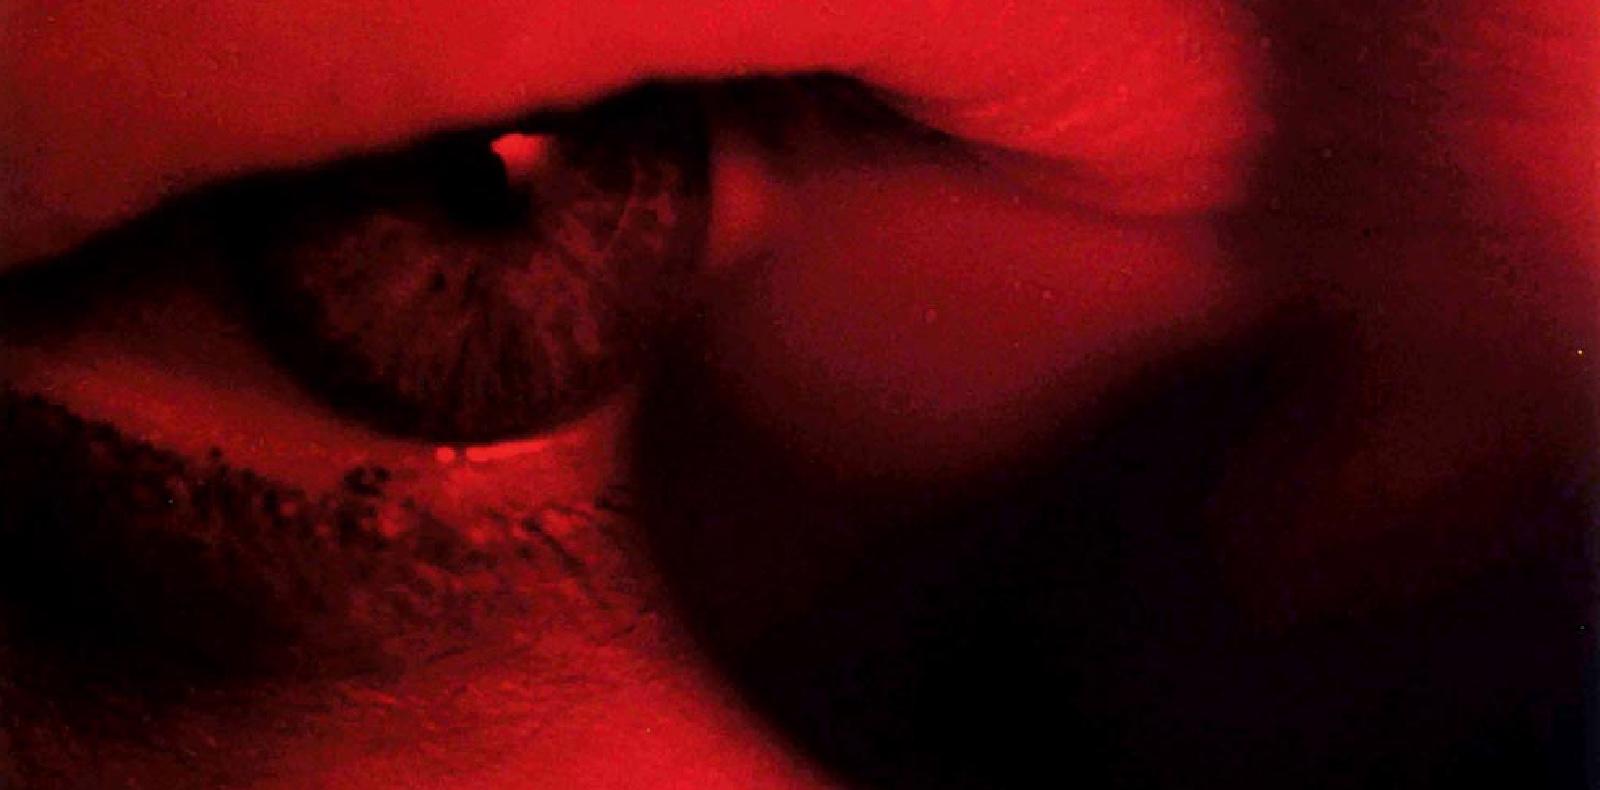 """Charlotte"" (2004) de Steve McQueen. Capture de film. Steve McQueen. Courtesy of the artist, Thomas Dane Gallery and Marian Goodman Gallery."